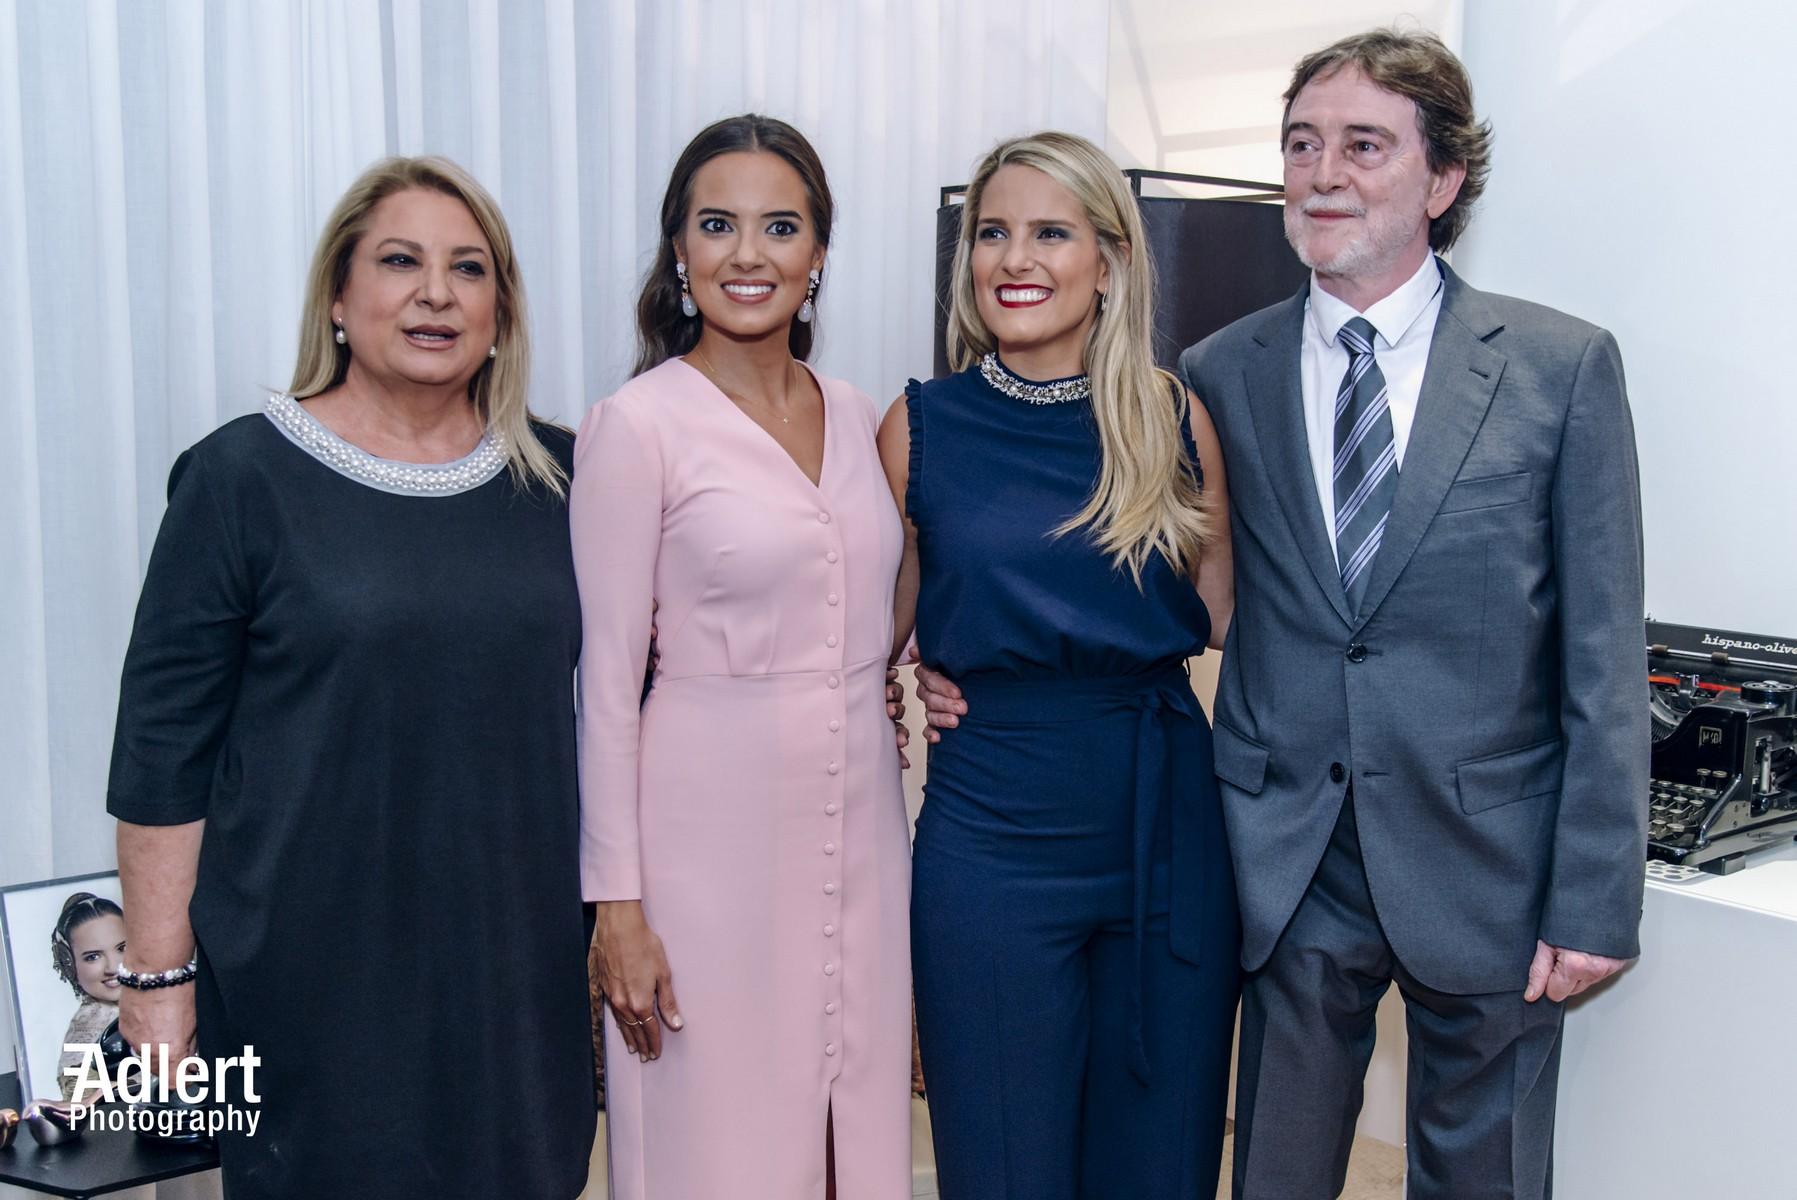 Marina Civera junto a sus padres y hermana / Fran Adlert